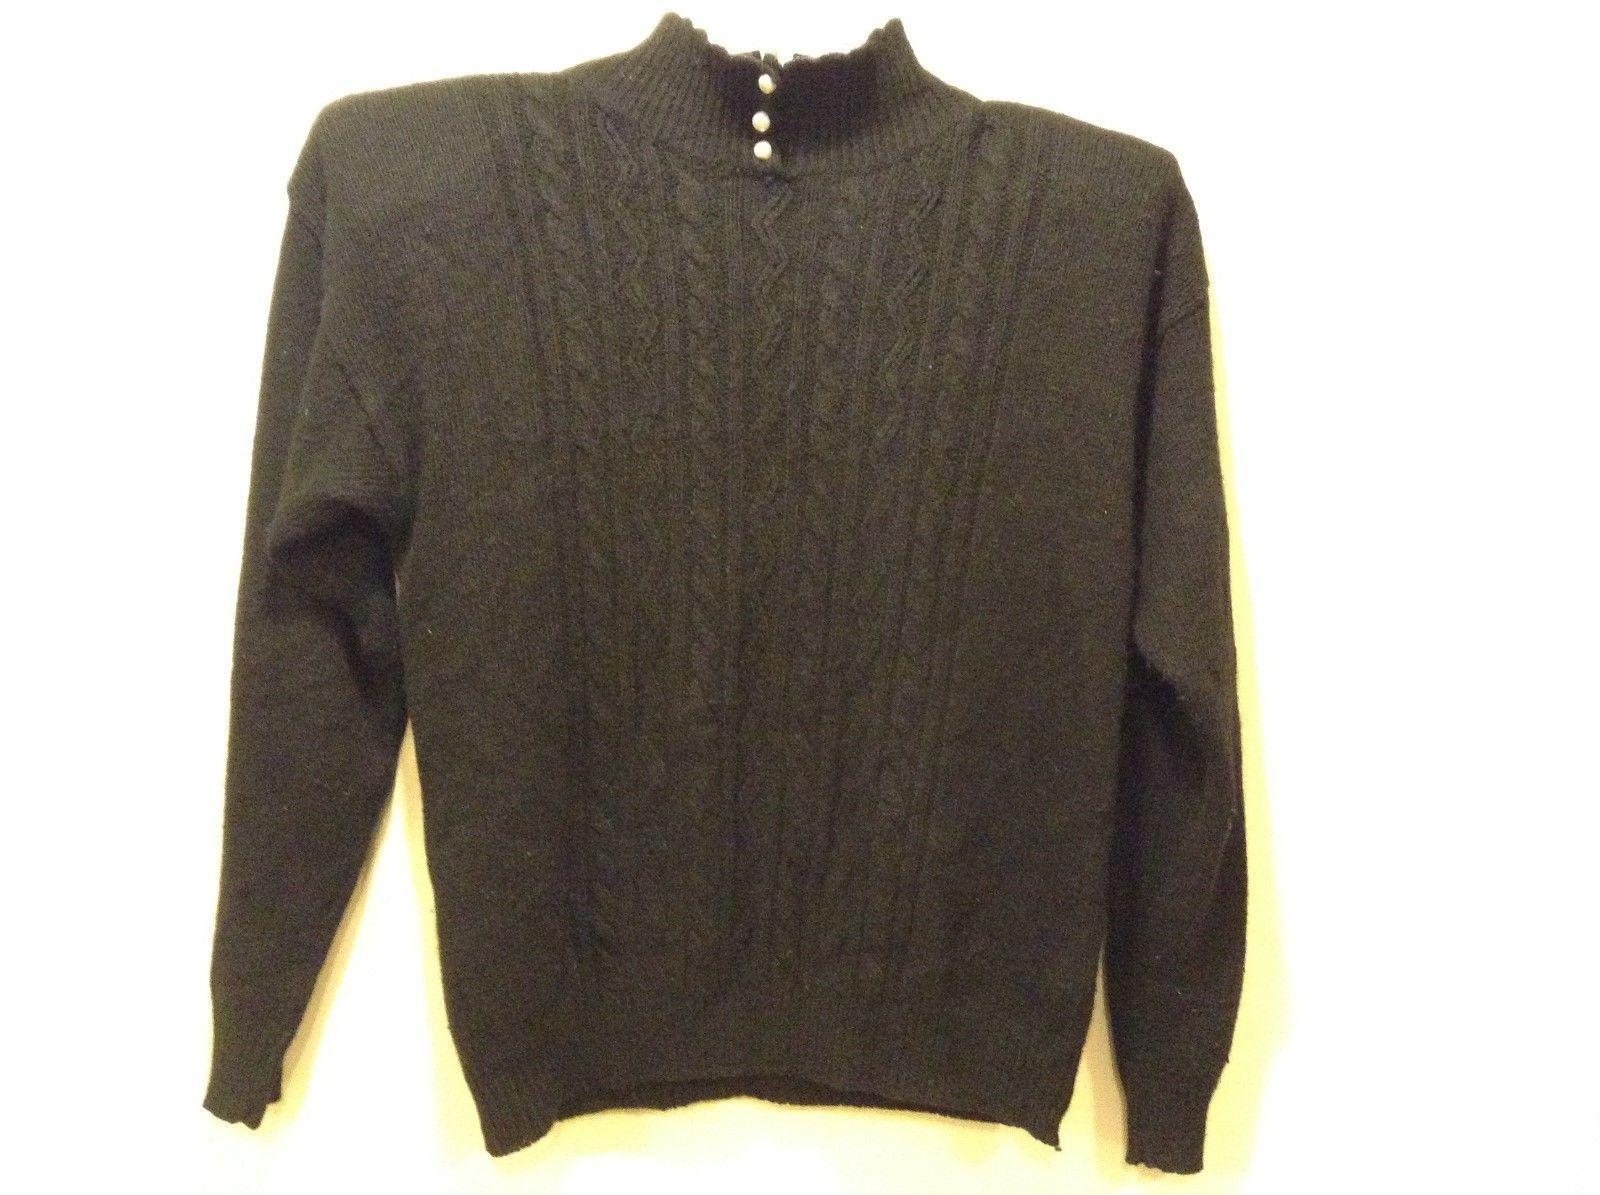 Spice of Life Black Silk-Blend Sweater Sz M